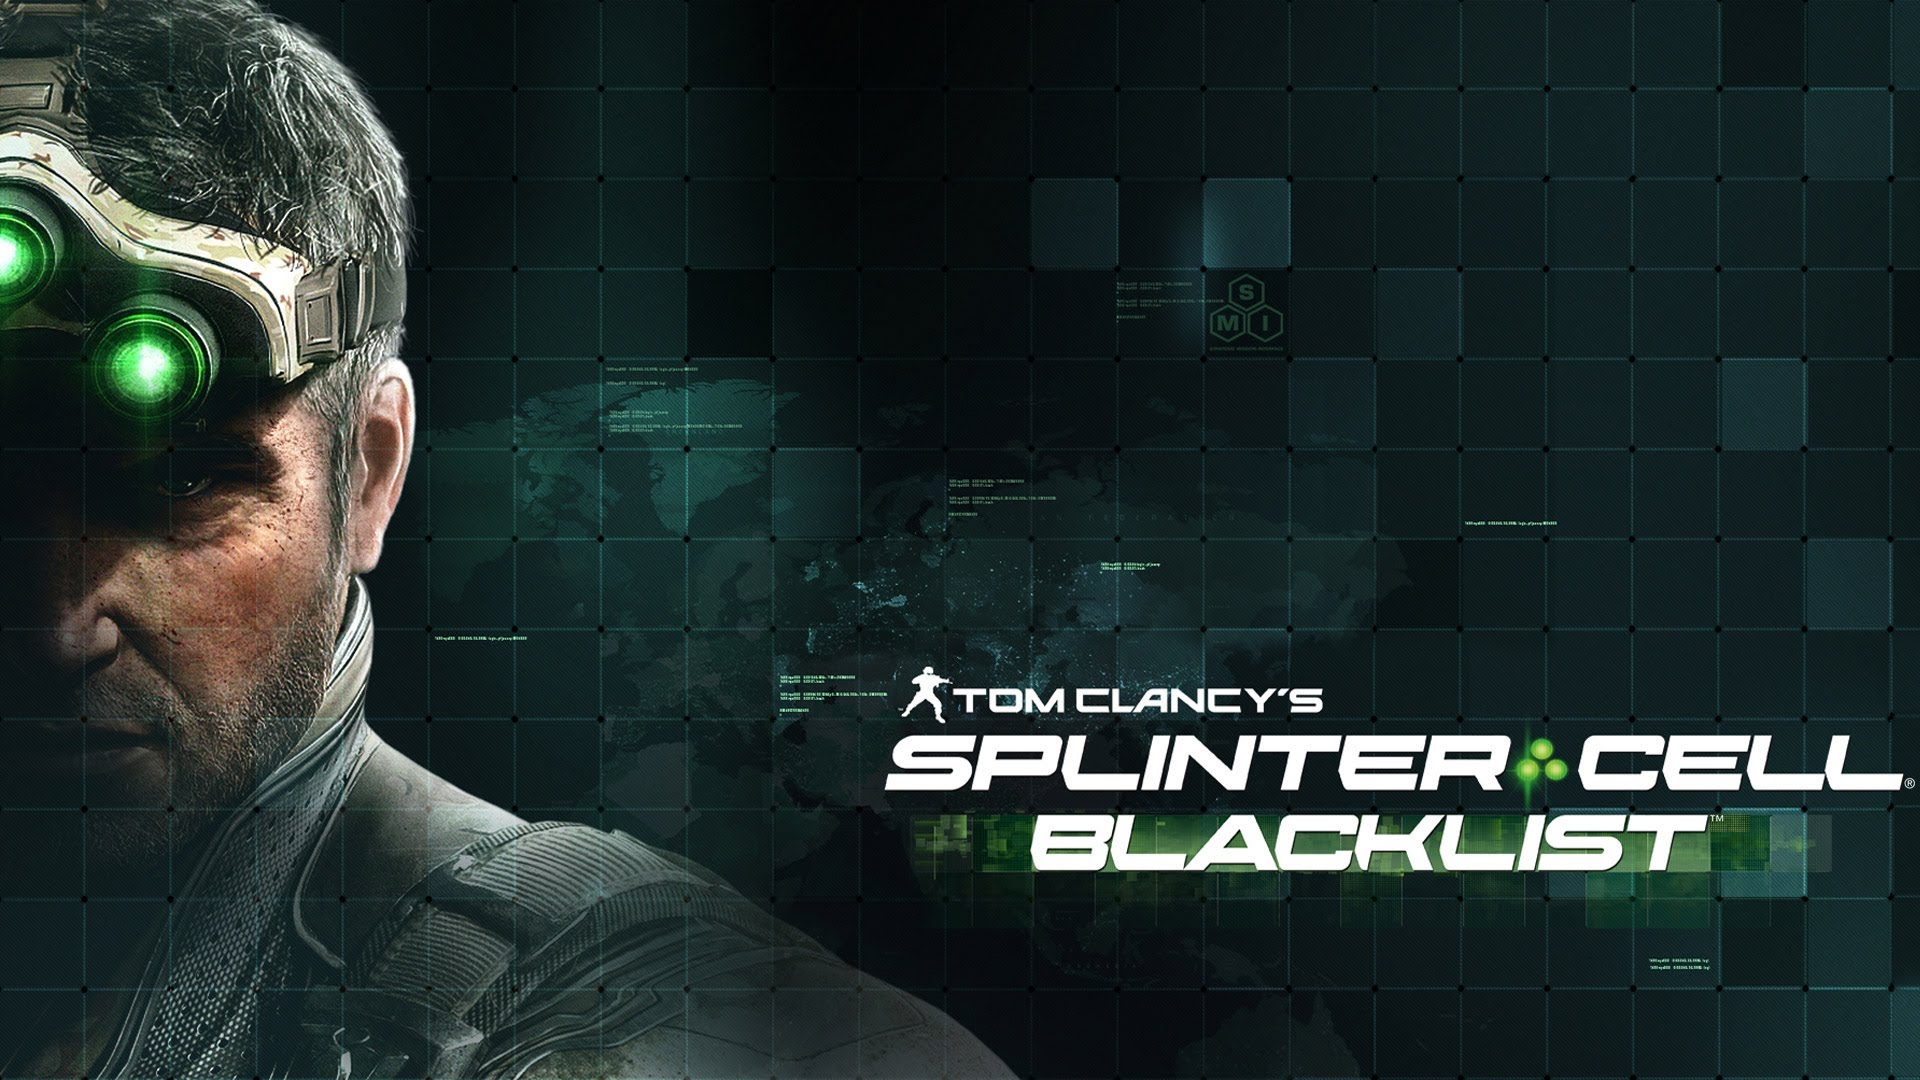 Splinter Cell Blacklist Wallpaper HD 1920x1080